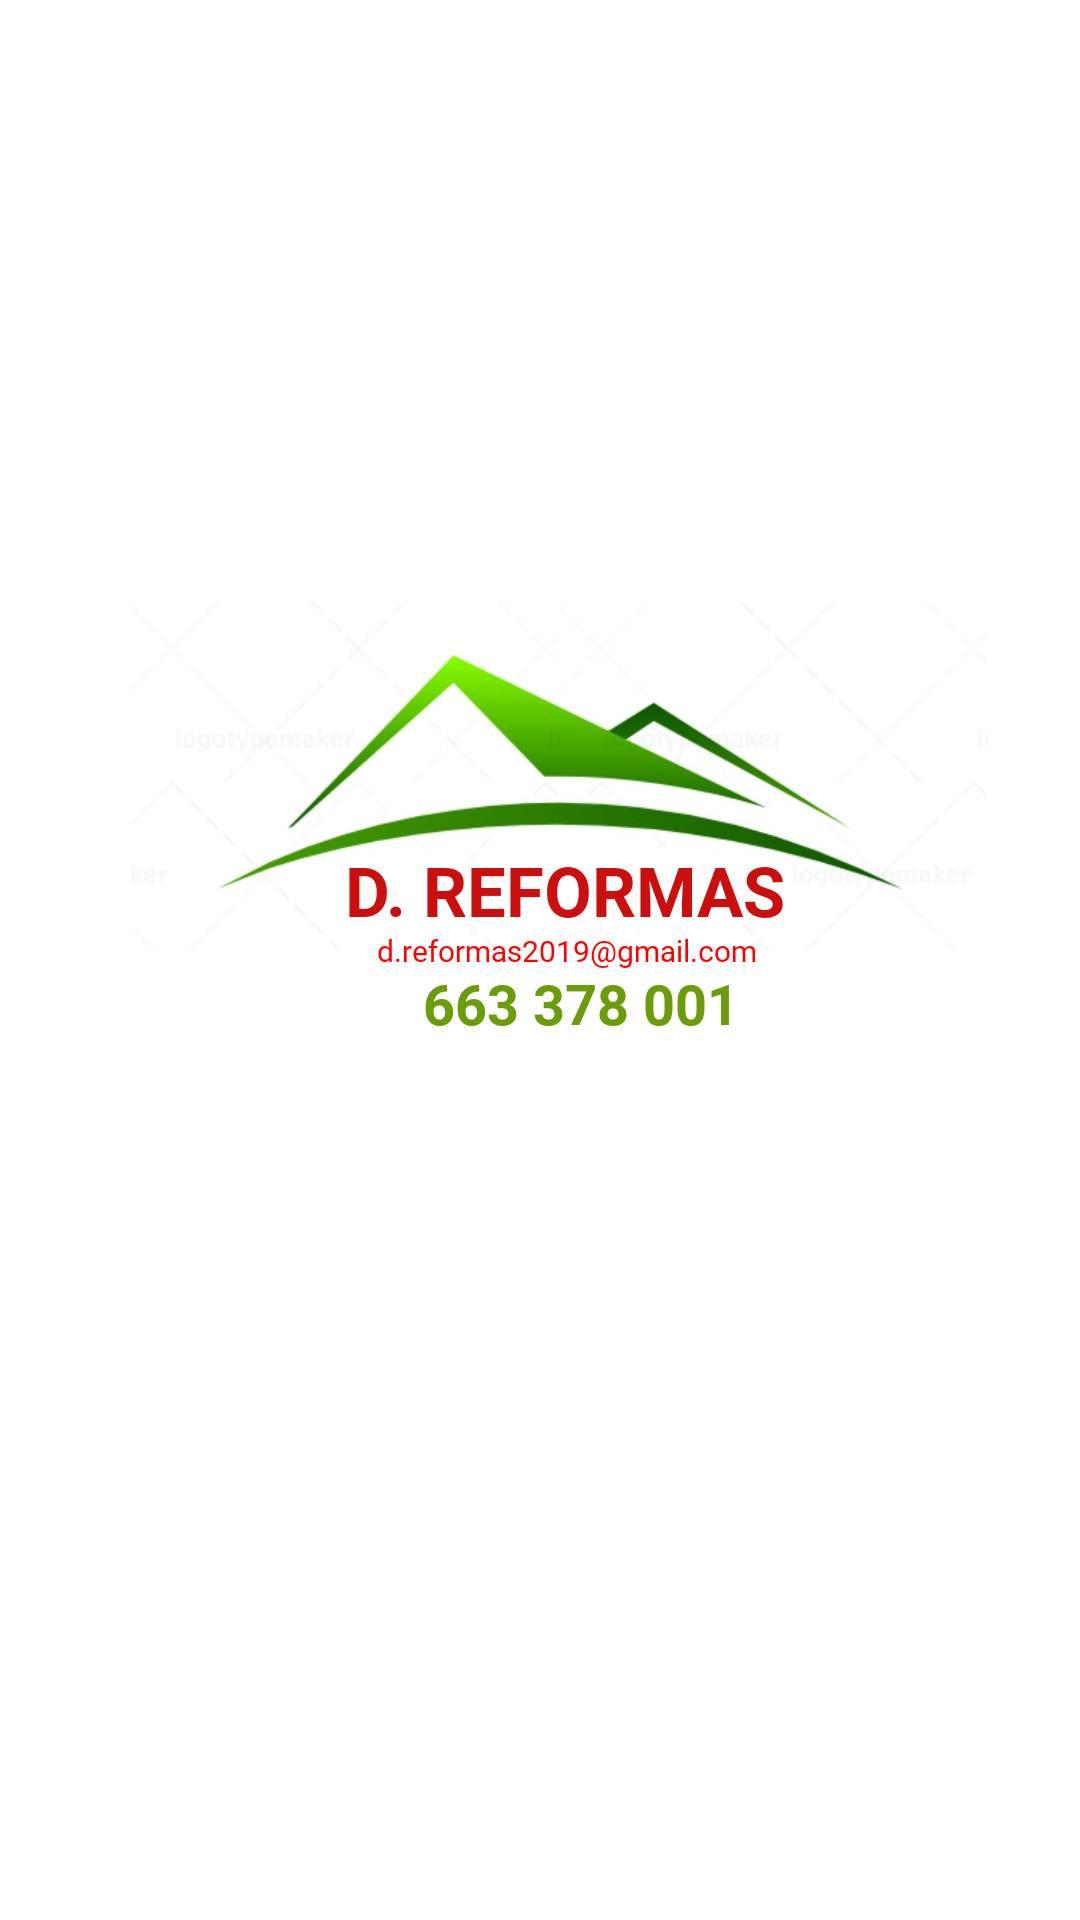 Reformas Doru Vasile